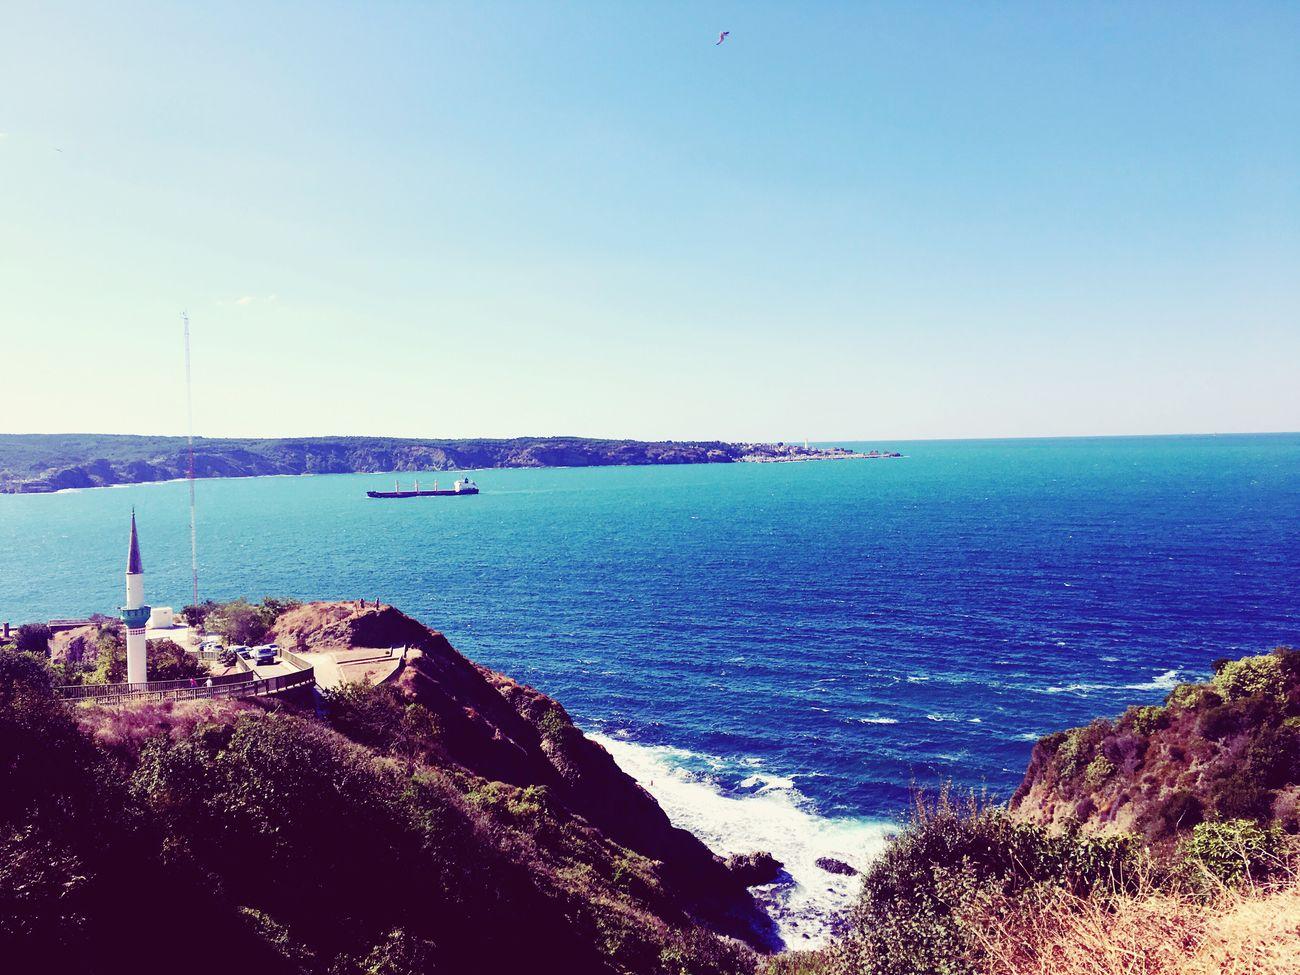 Old Phone Photo Sea Blue Scenics Outdoors Coastline Rock Formation Day Shore Nature